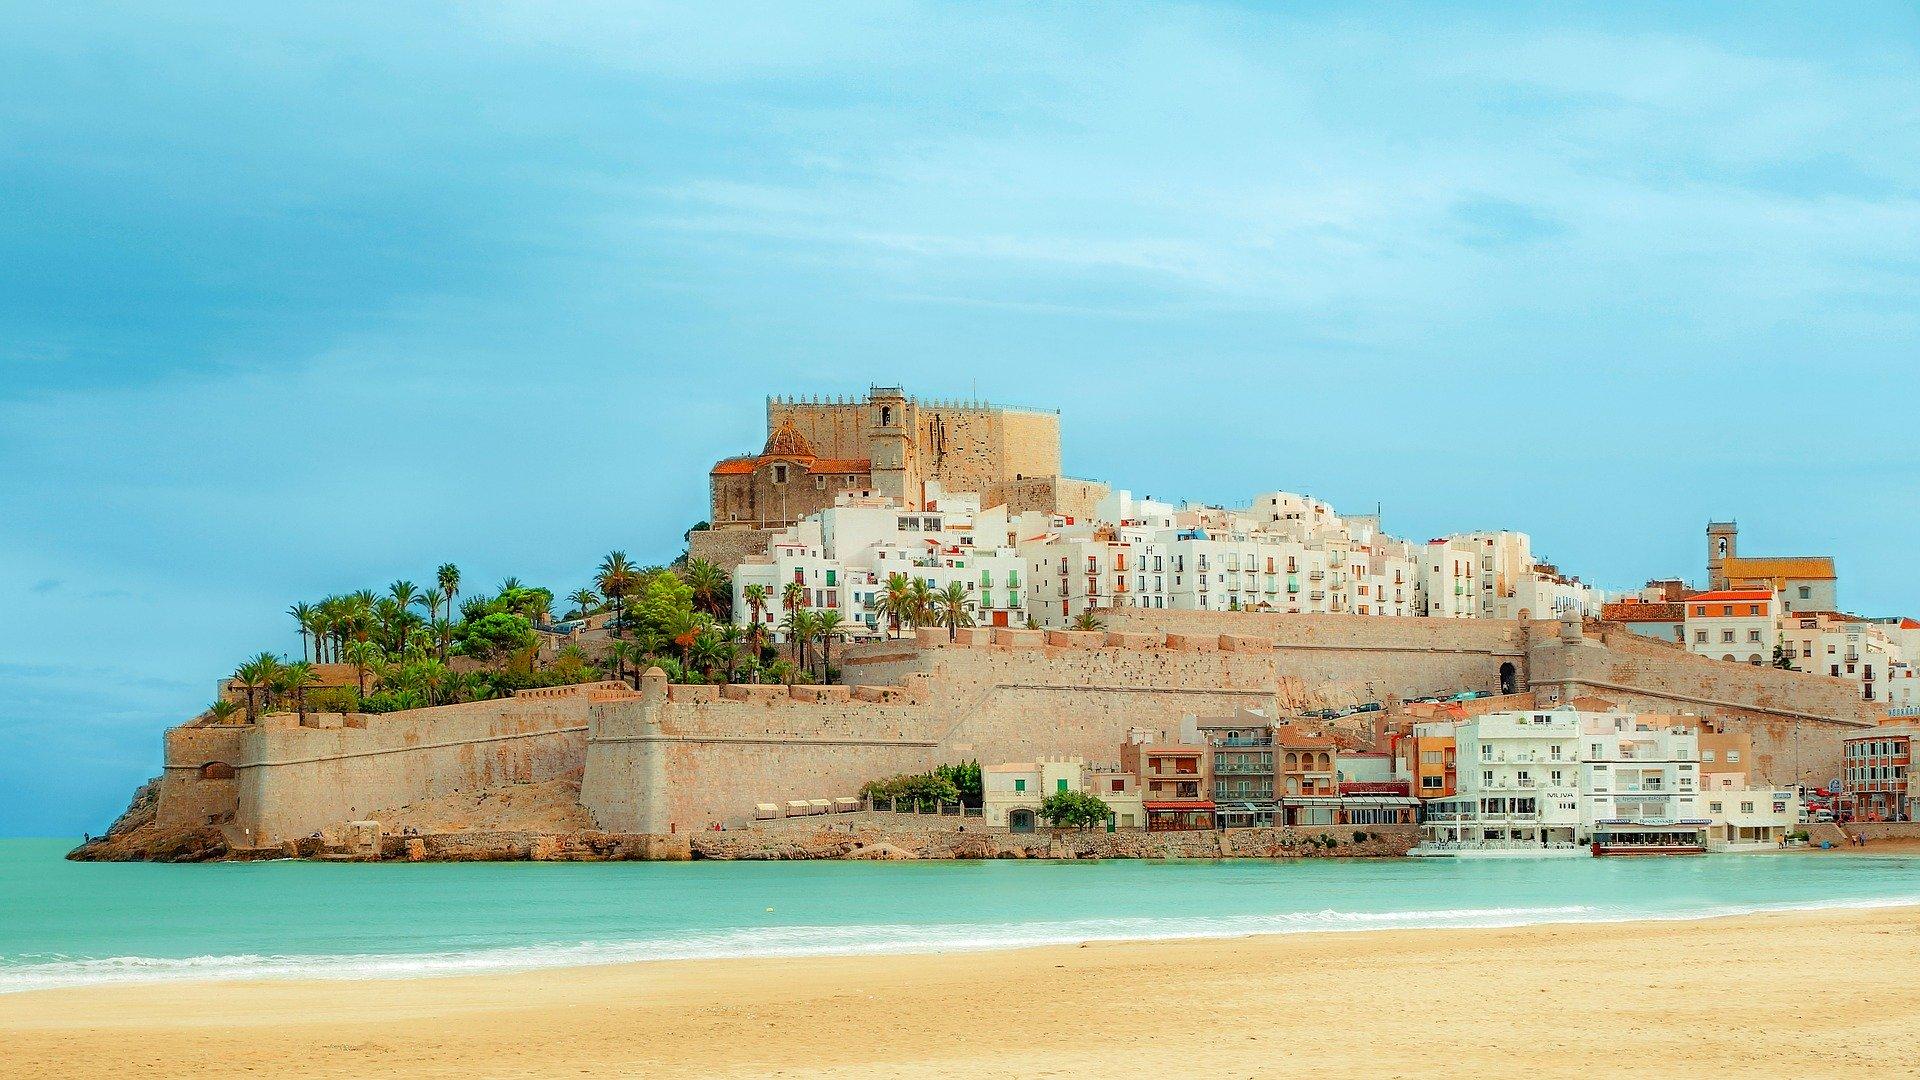 Spanien Reisewarnung - Corona begräbg Tourismus bis September